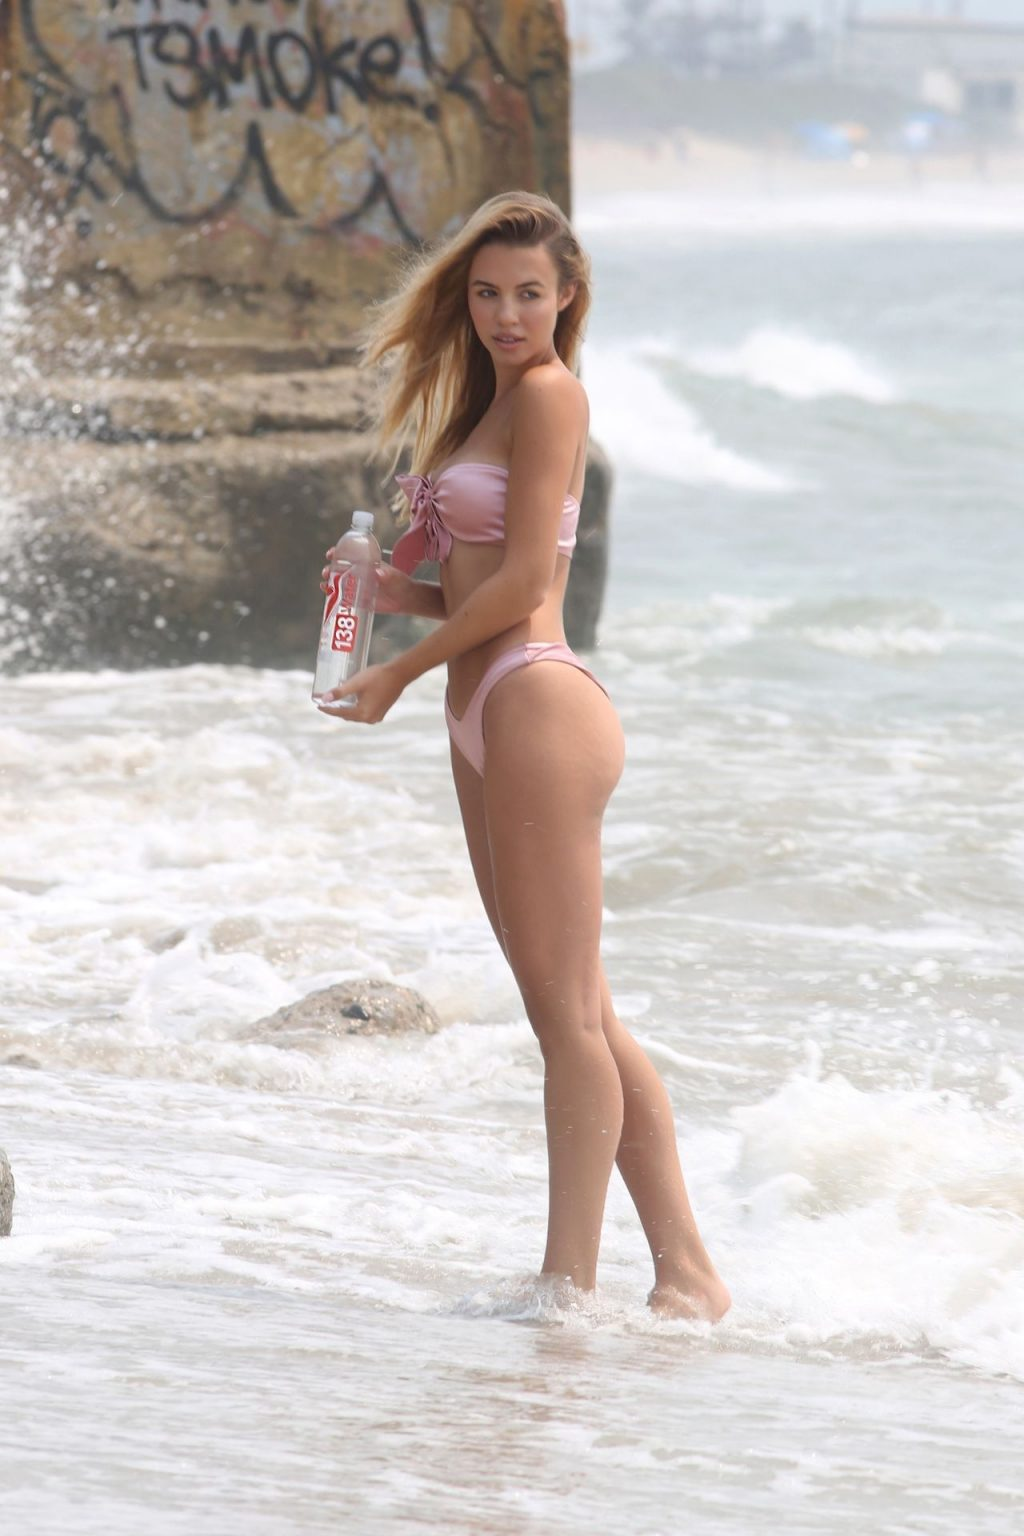 Elizabeth Montgomery Poses in a Sexy Pink Bikini on the Beach in Malibu (25 Photos)